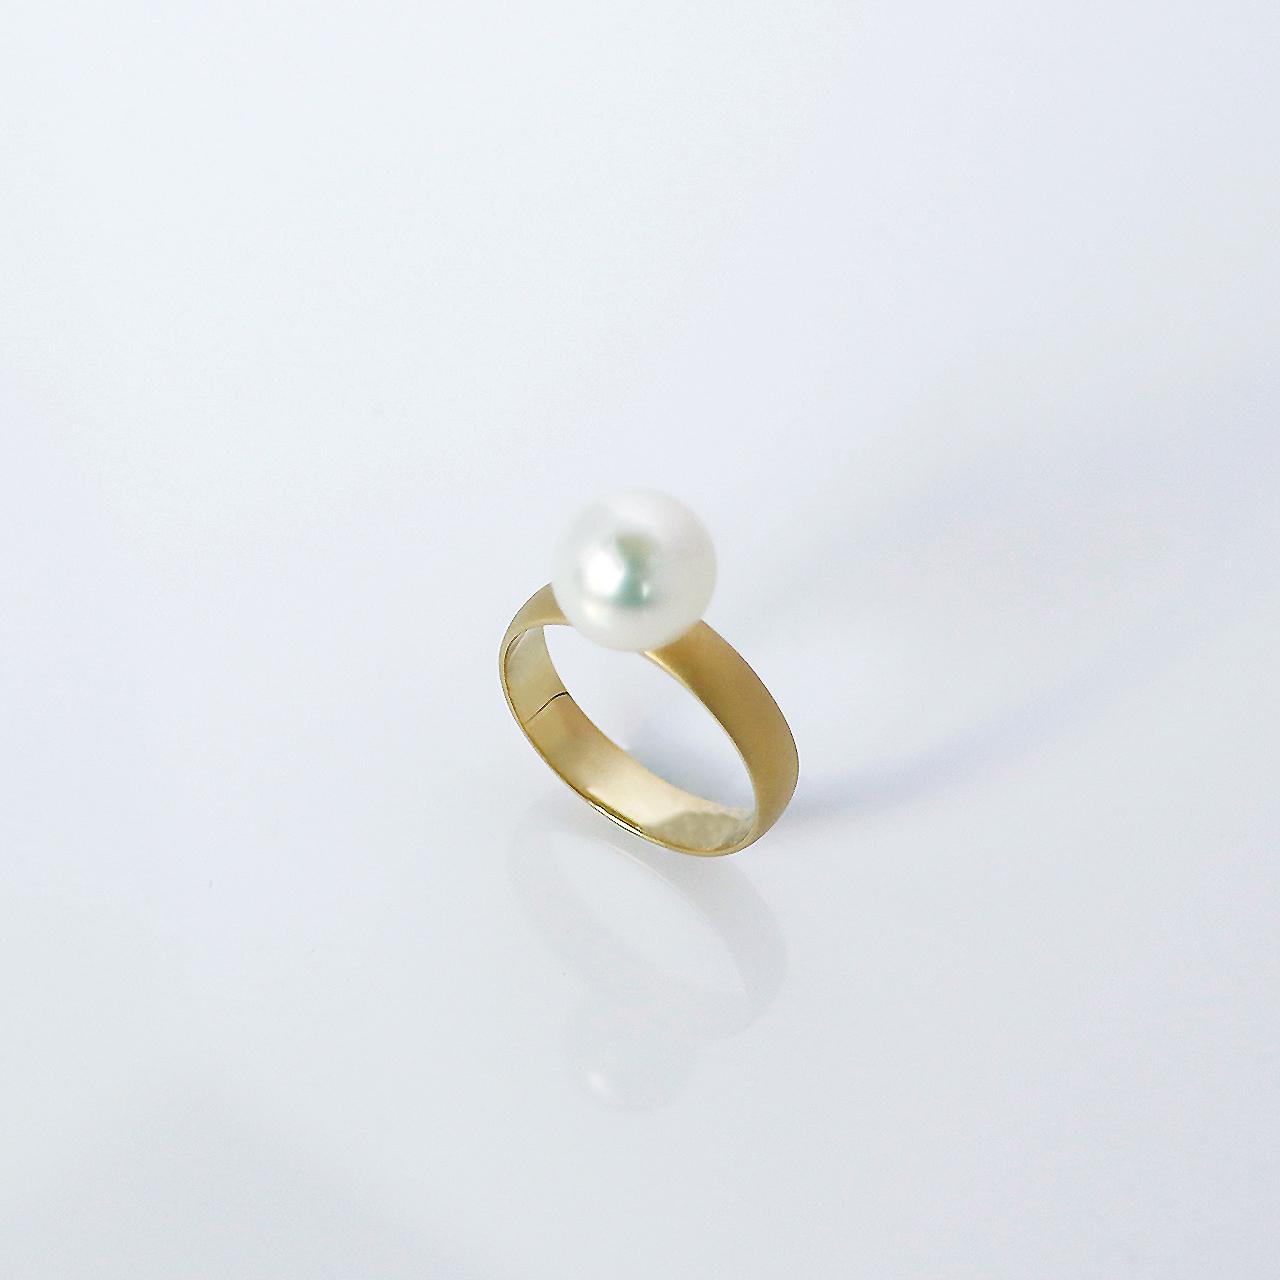 FREELY / Ring (Natural White , Honing)